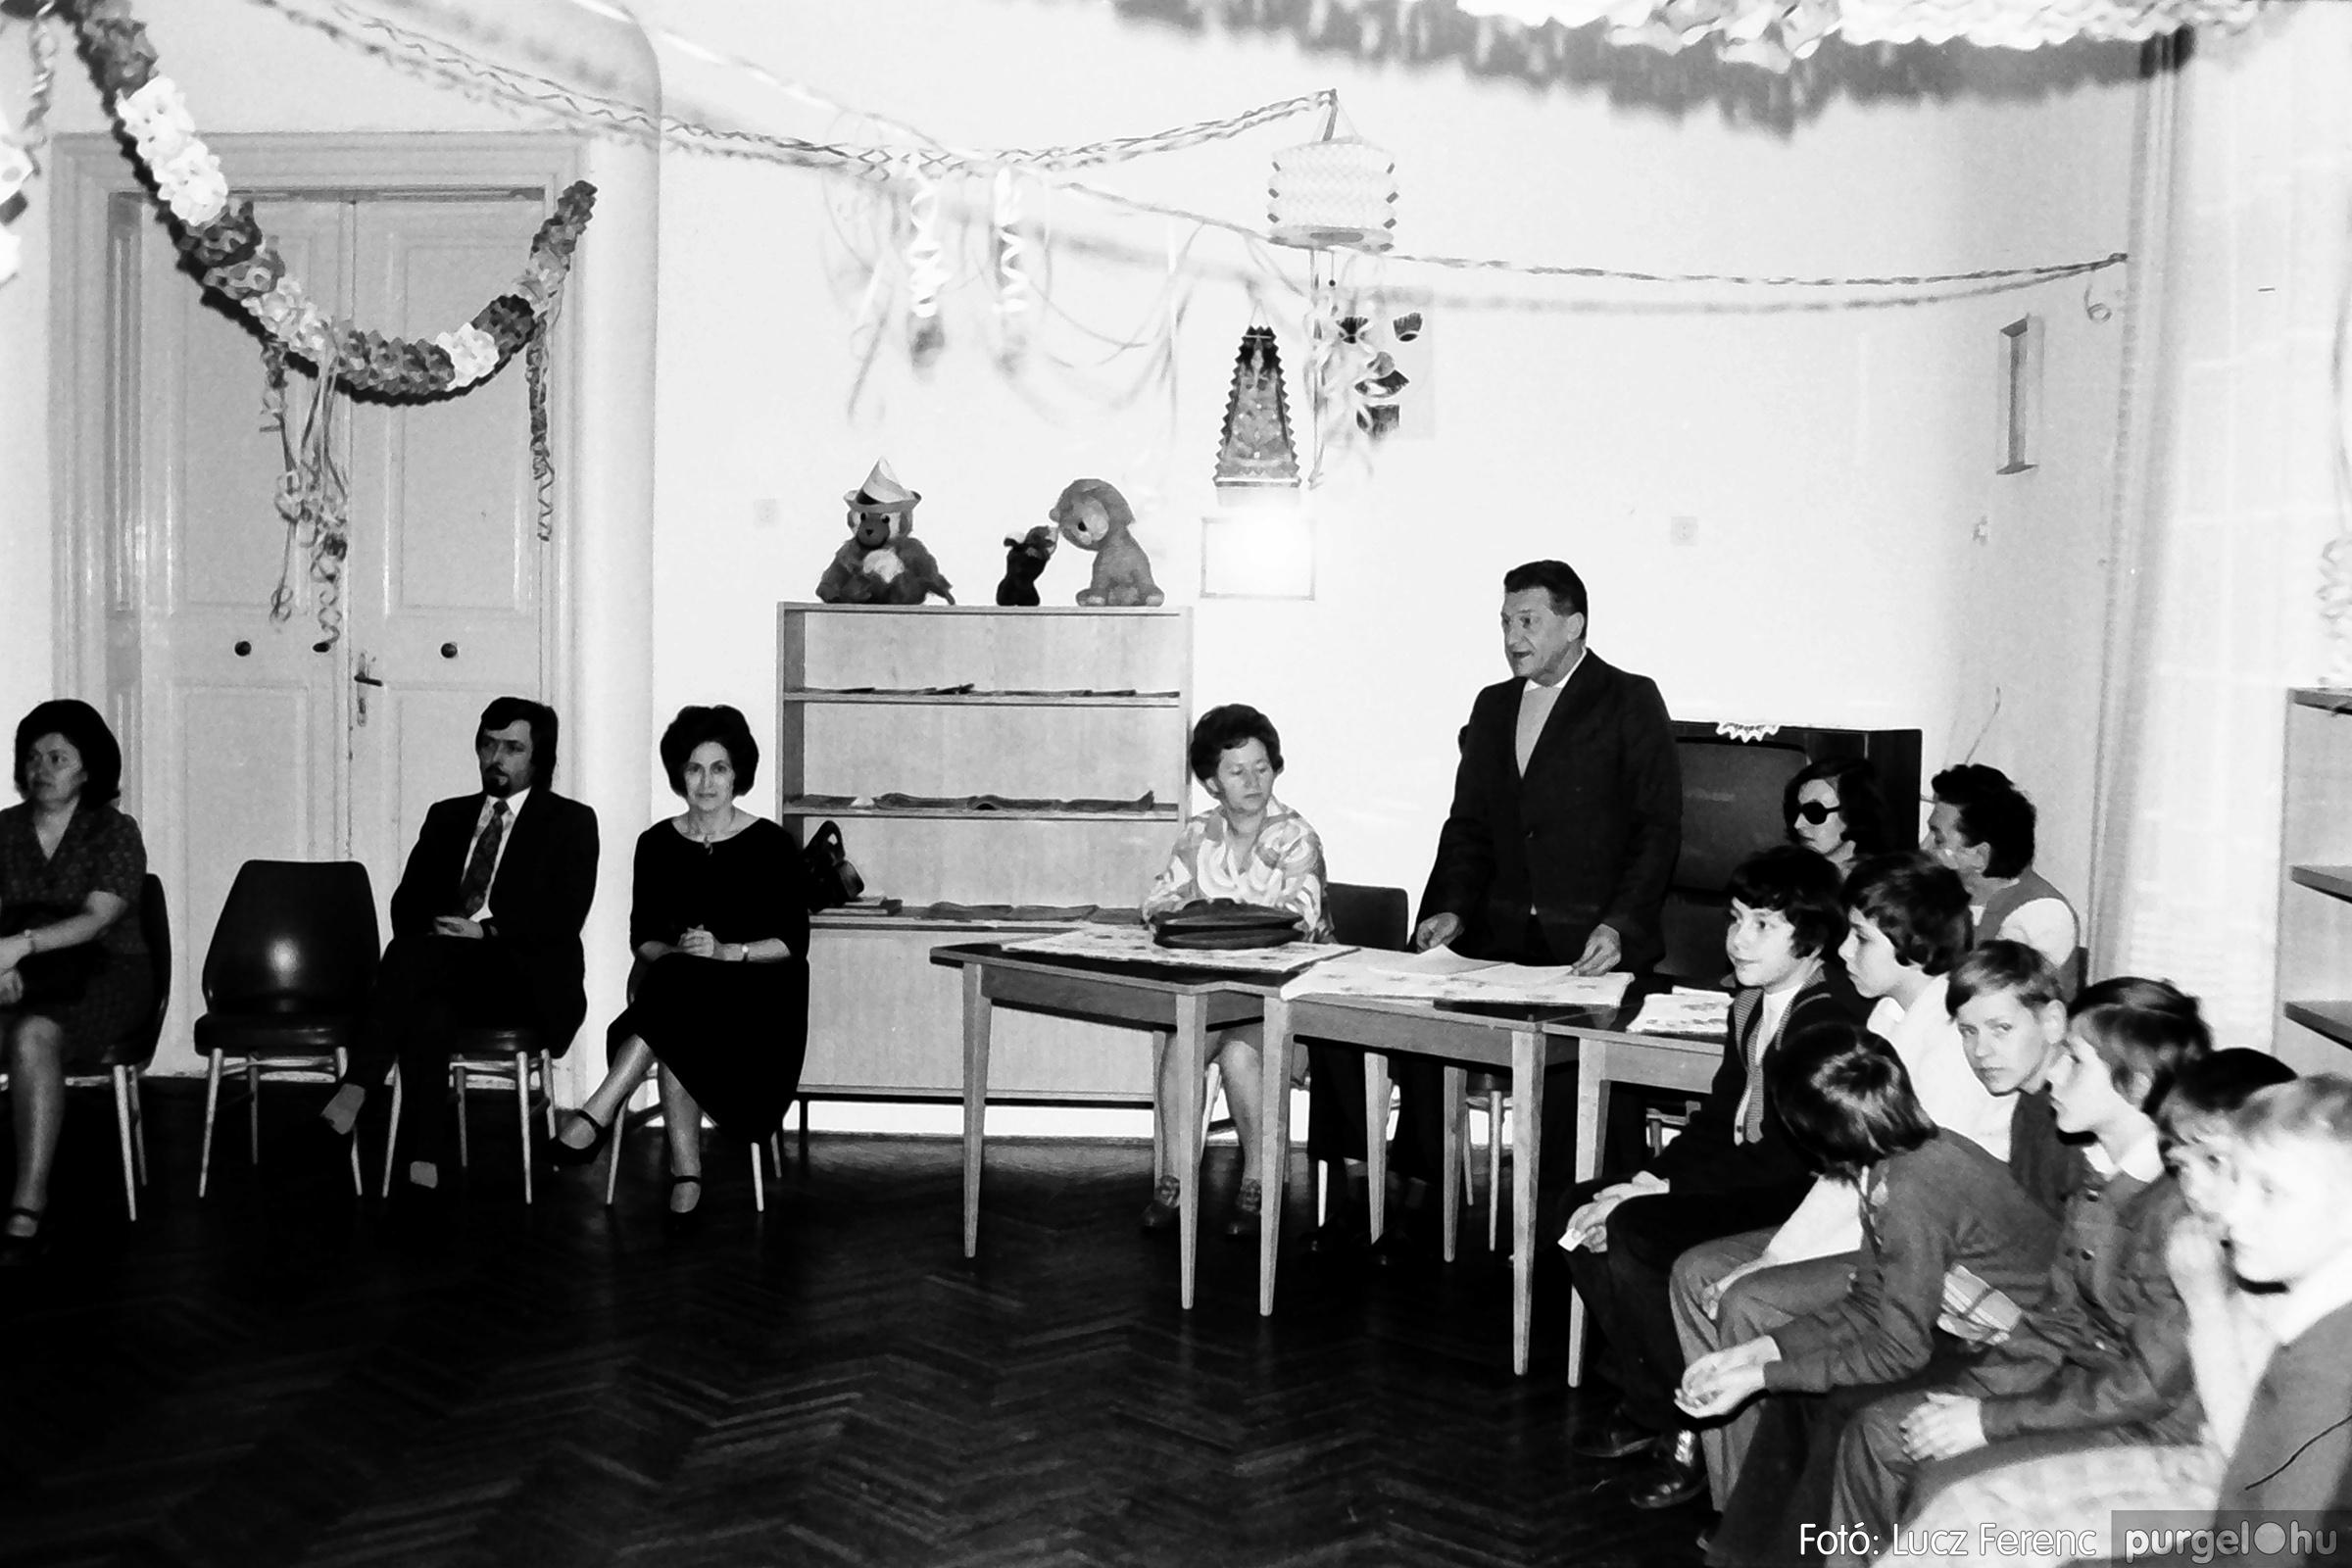 074. 1977. Farsang a gyermekotthonban 001. - Fotó: Lucz Ferenc.jpg